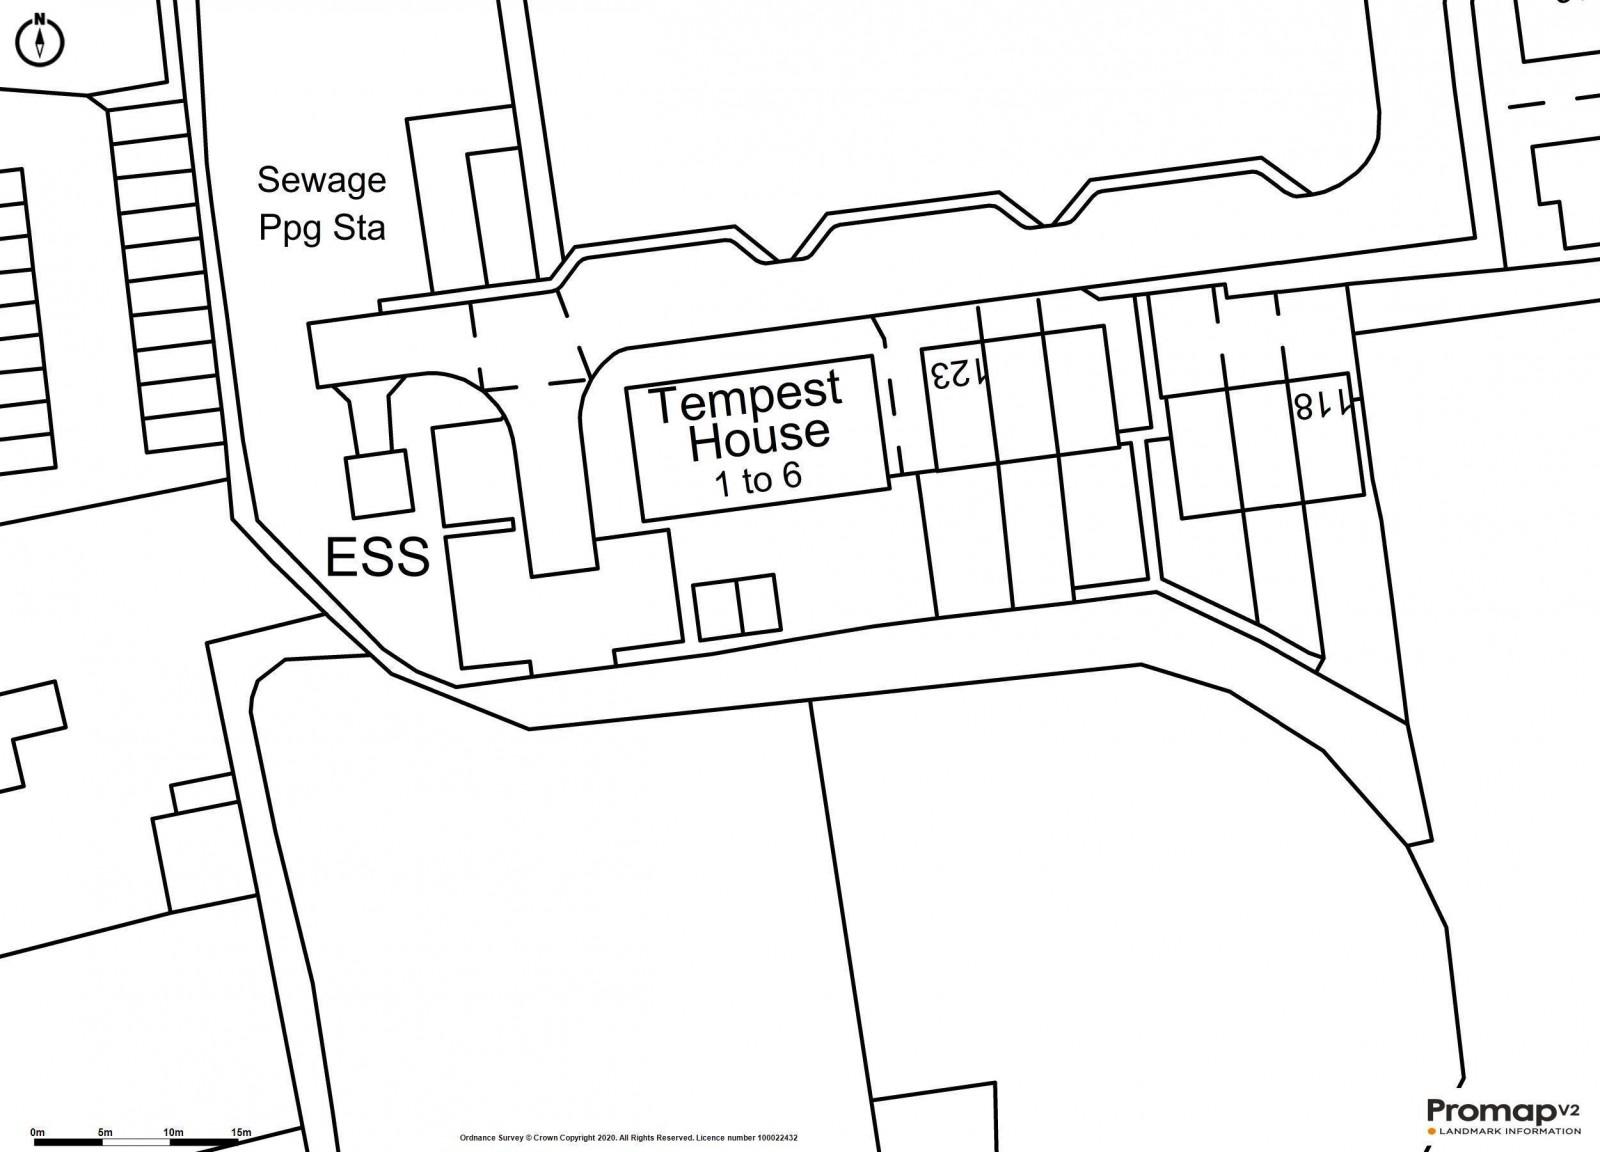 6 Tempest House